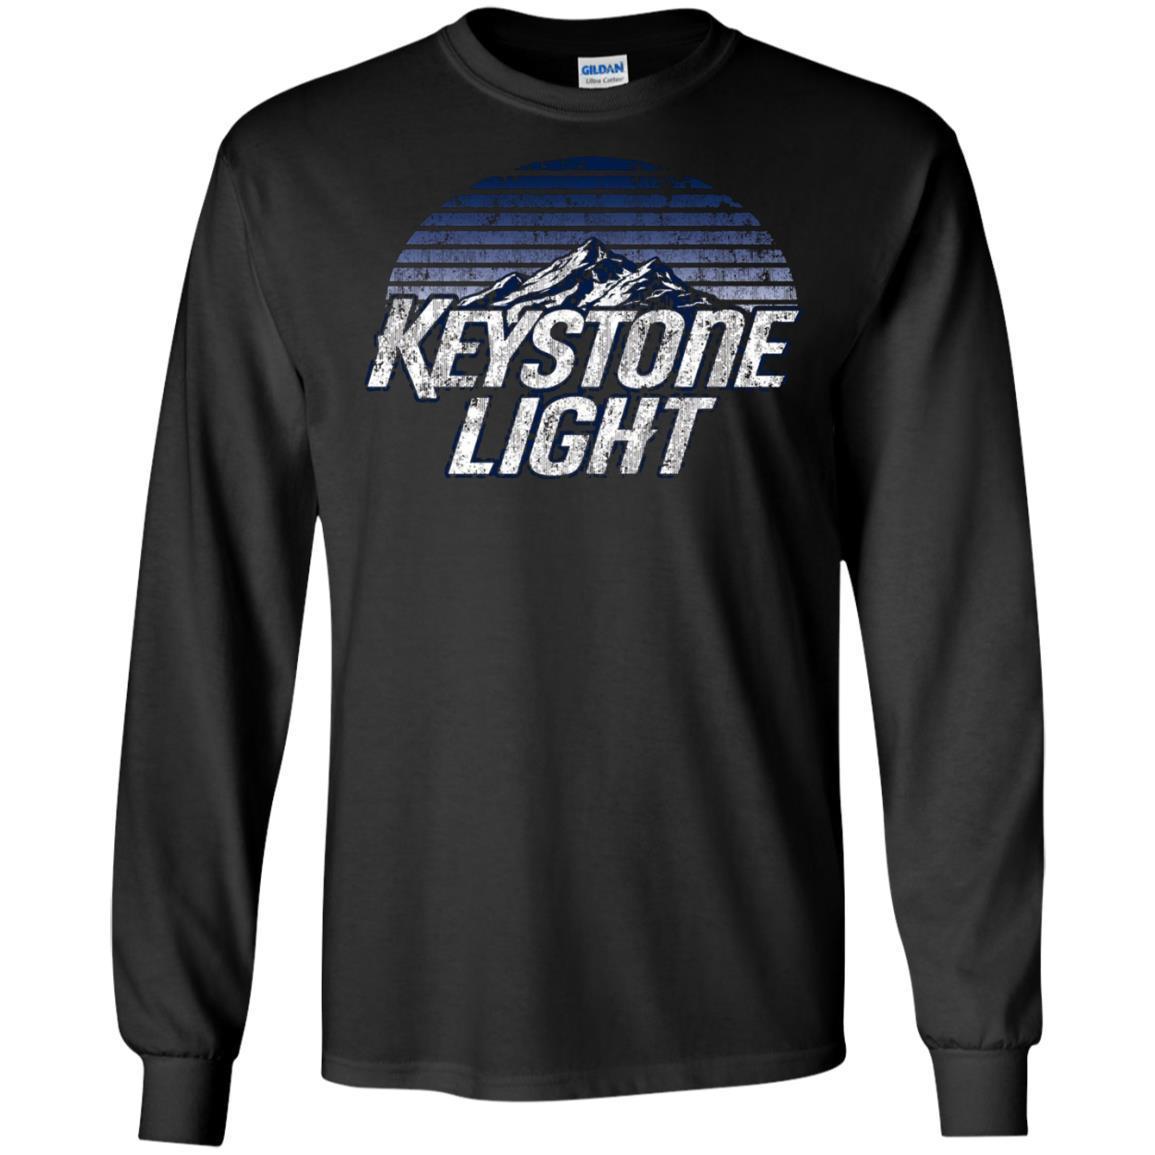 Keystone Light Beer Classic Look – LS T-Shirt